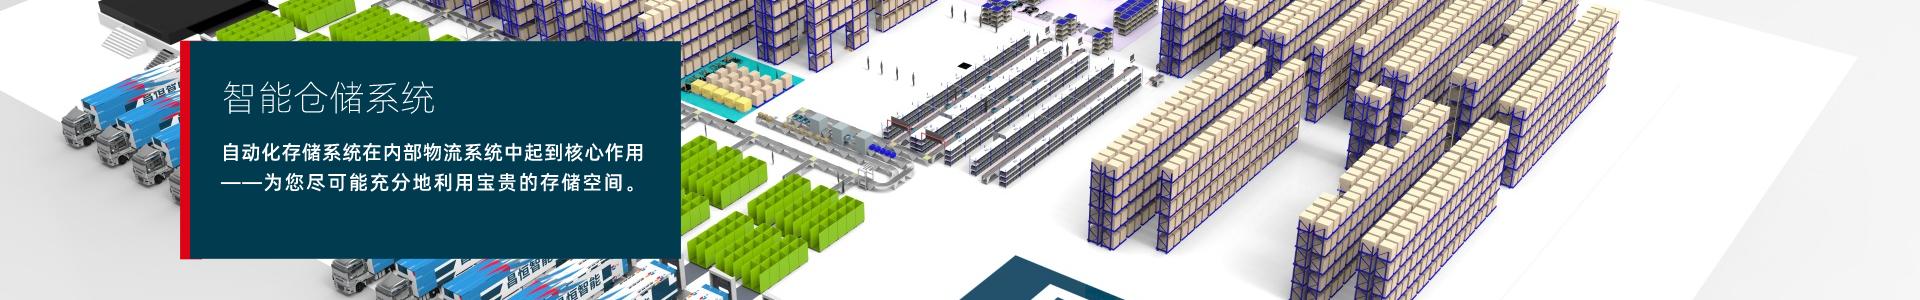 WCS 仓库控制系统